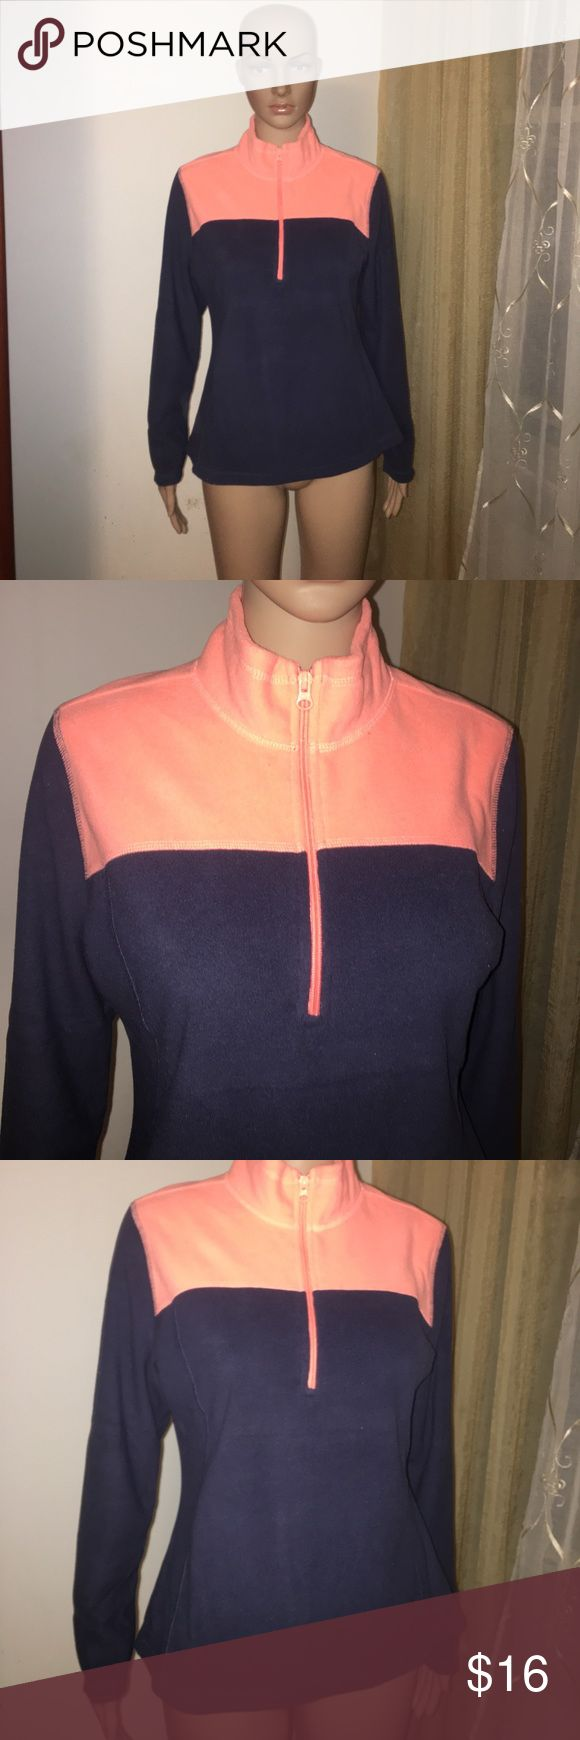 Old navy y fleece zip up medium orange women's Gently used. O no stains or holes super cute on Old Navy Tops Sweatshirts & Hoodies